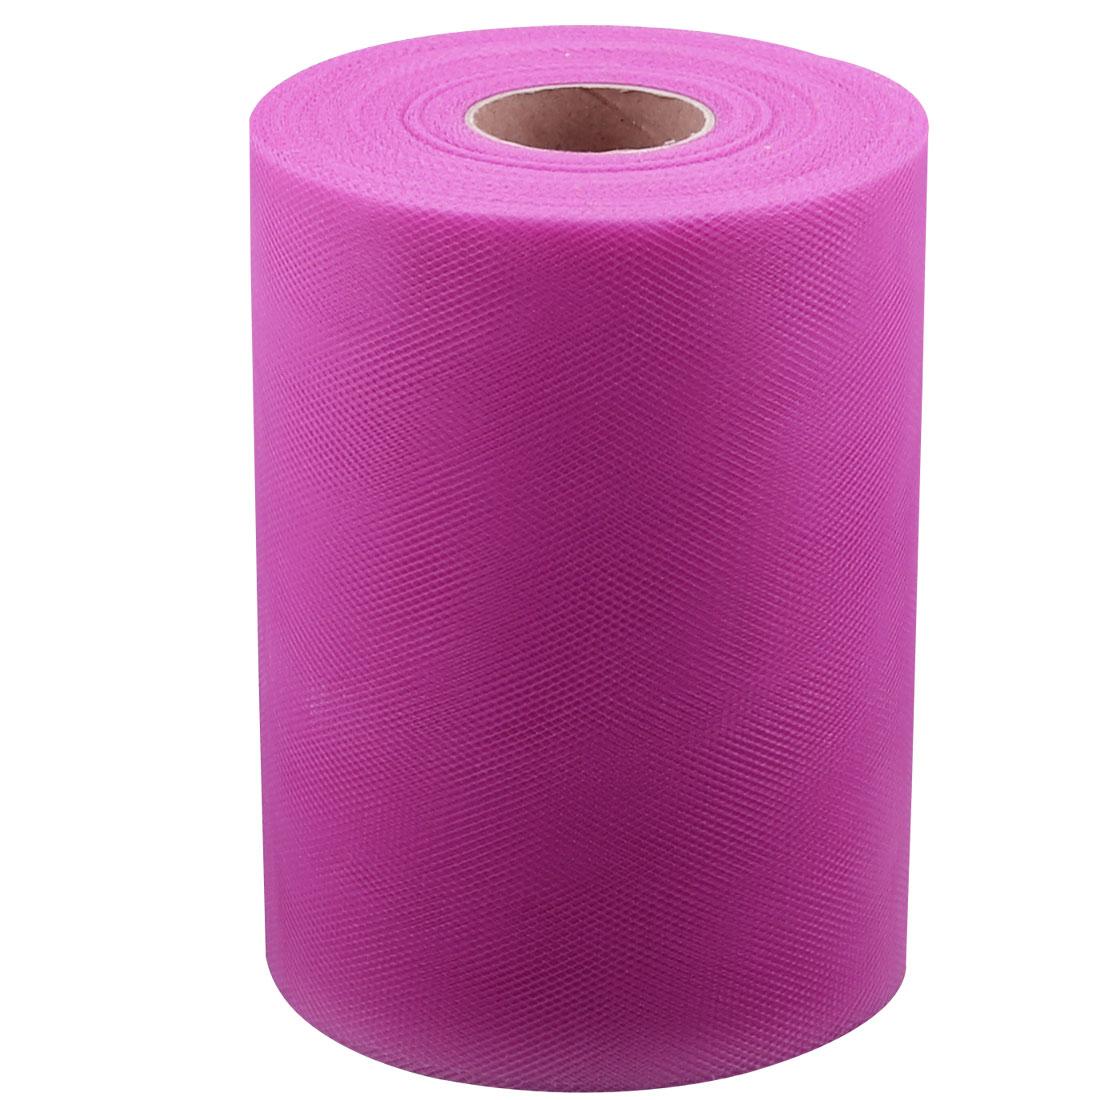 Banquet Wedding Party Nylon Fabric DIY Tutu Tulle Roll Spool Decor Fuchsia 100 Yards